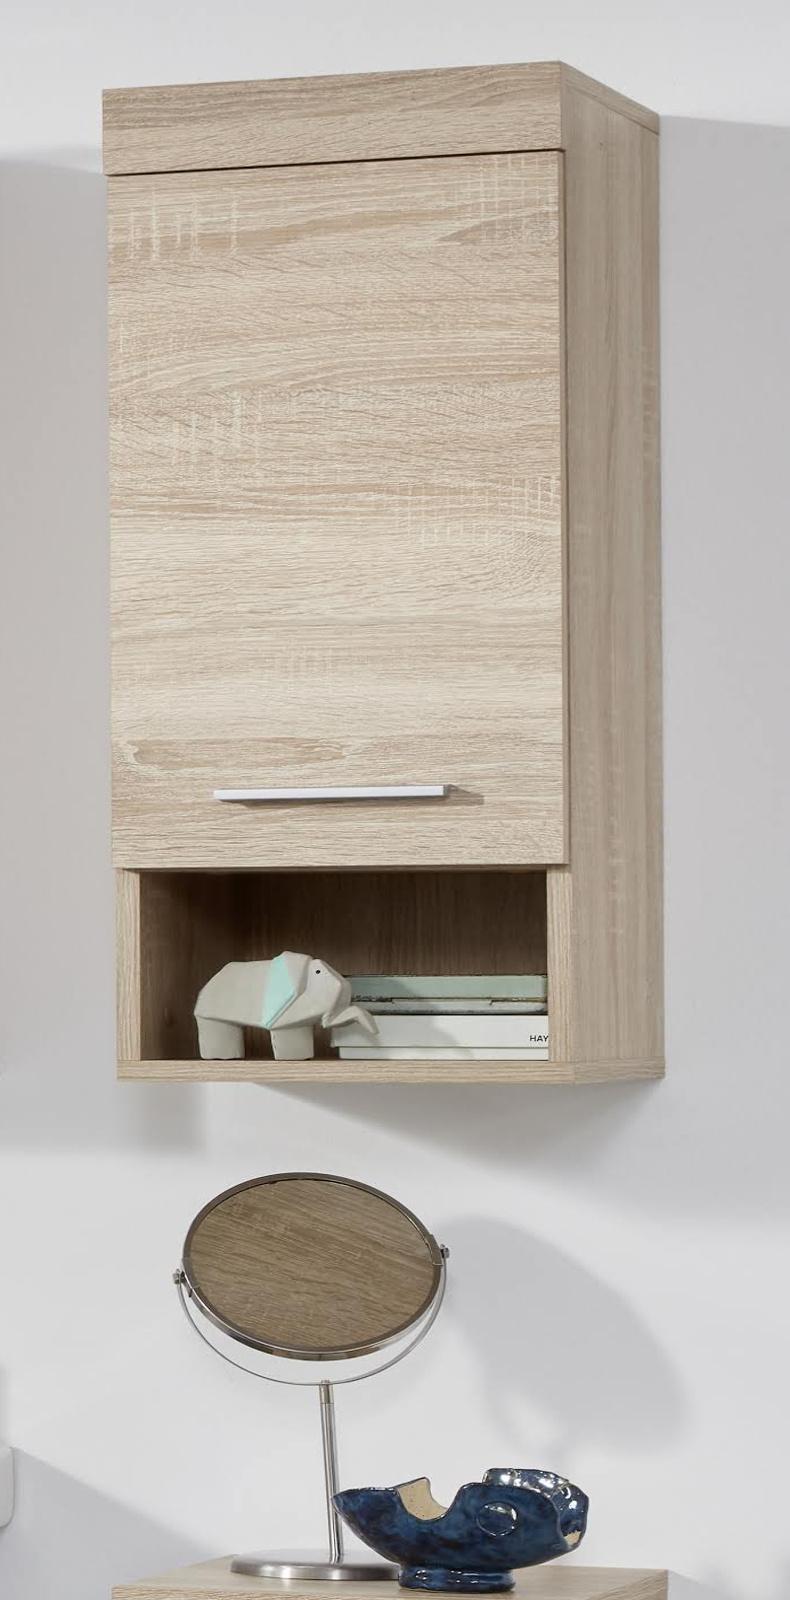 massivholz wohnwand teilmassiv eiche hell pondio ebay. Black Bedroom Furniture Sets. Home Design Ideas